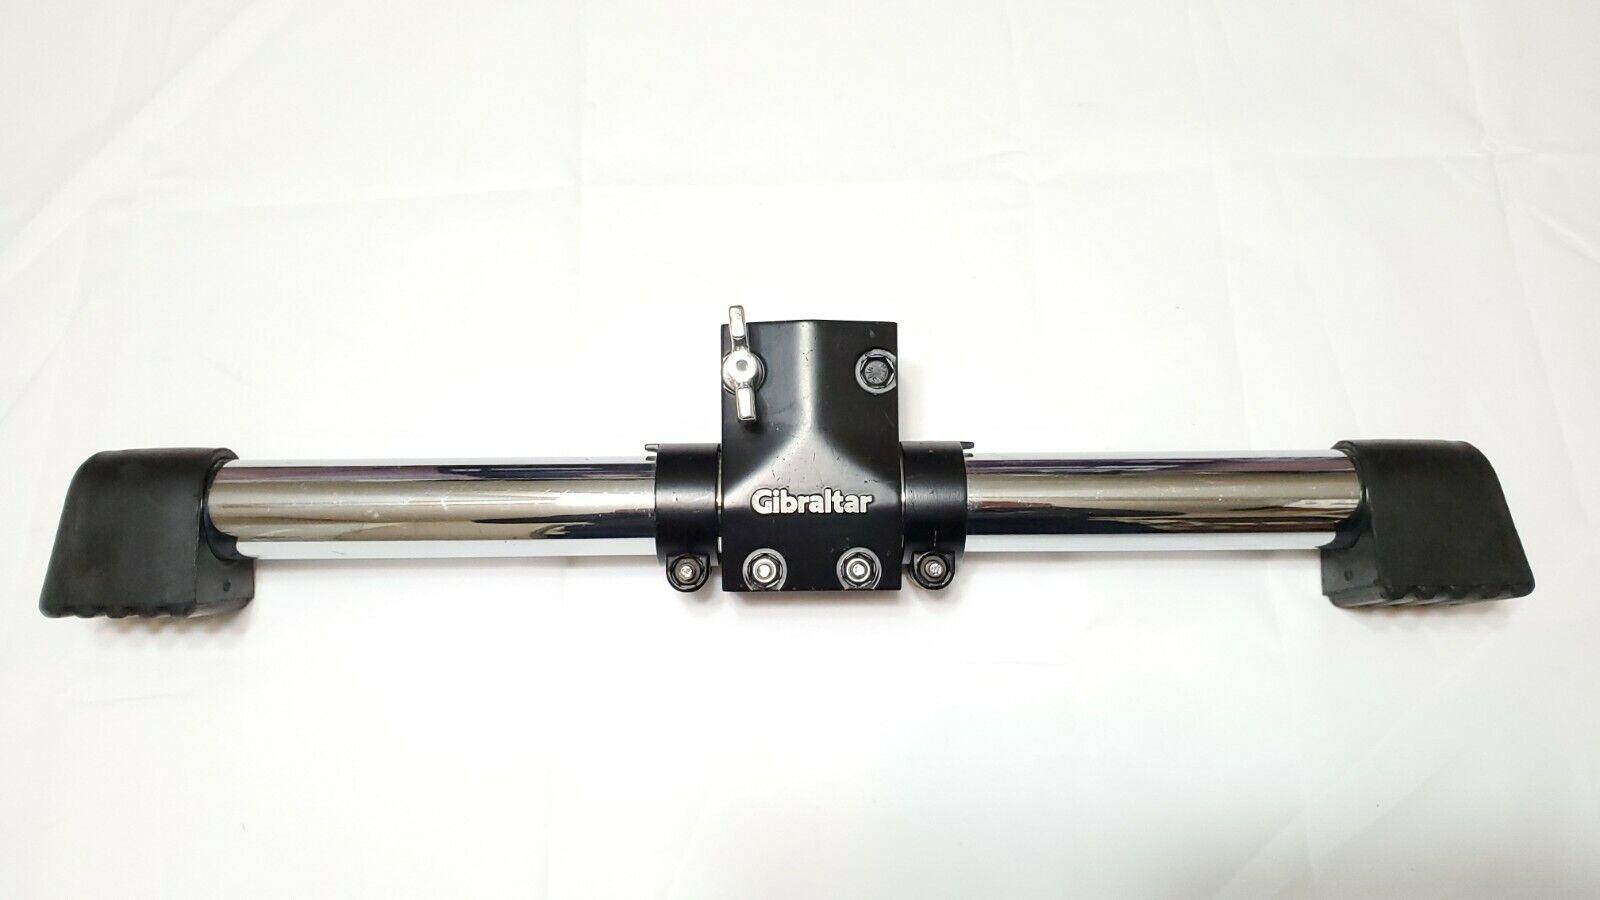 GIBRALTAR RACK T-LEG FRAME EXTENSION DRUM SET CLAMP STAND ASSEMBLY SC-GRSTLA - $59.98